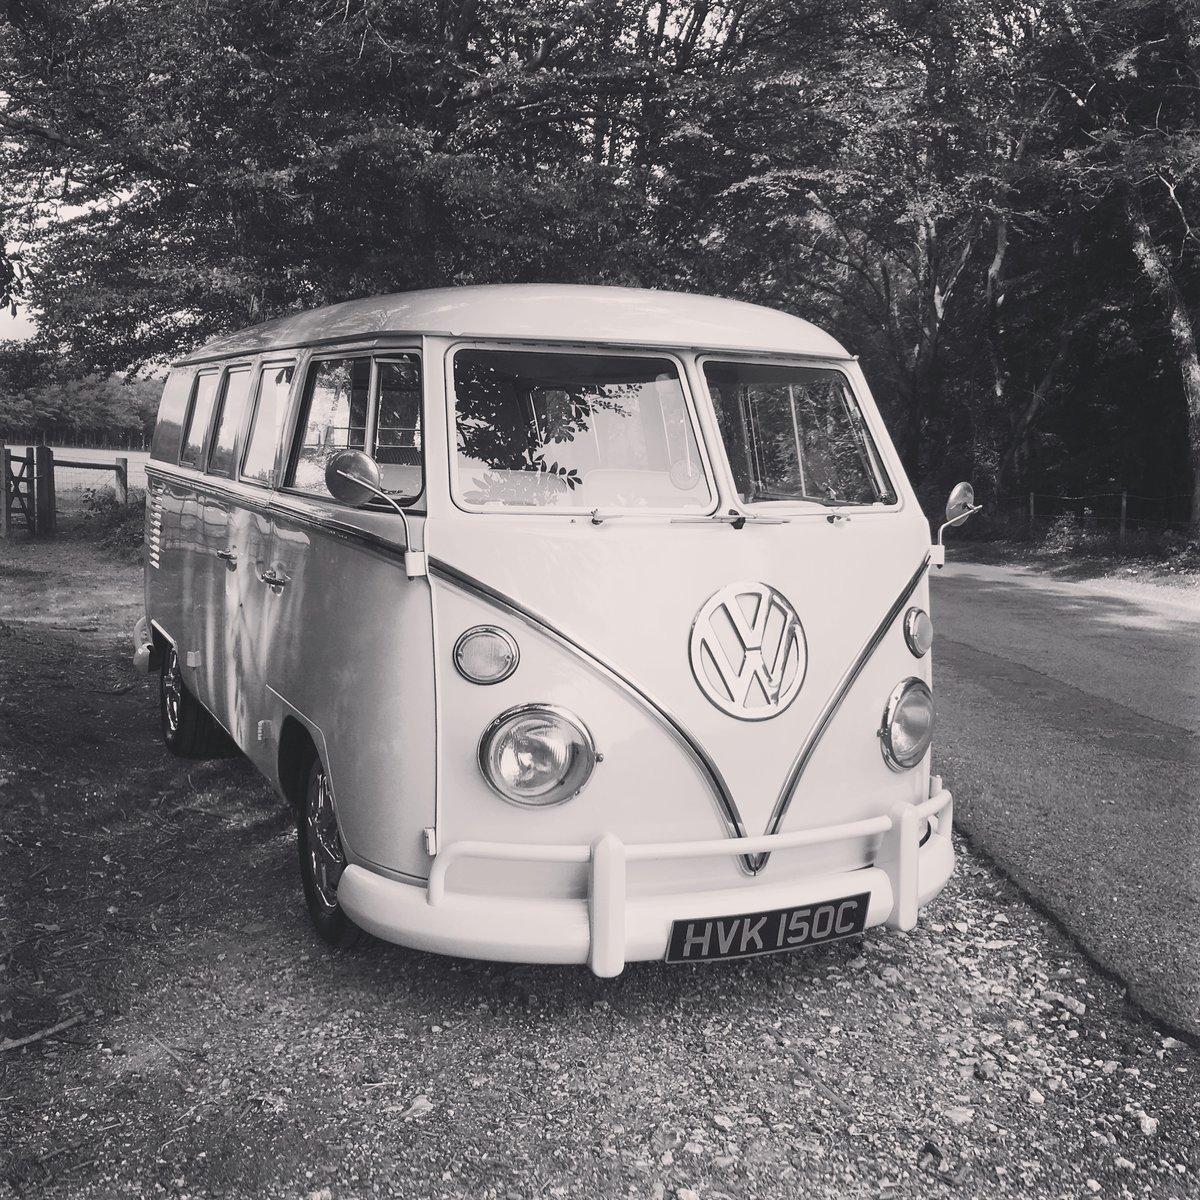 1965 VW Splitscreen campervan For Sale (picture 6 of 6)